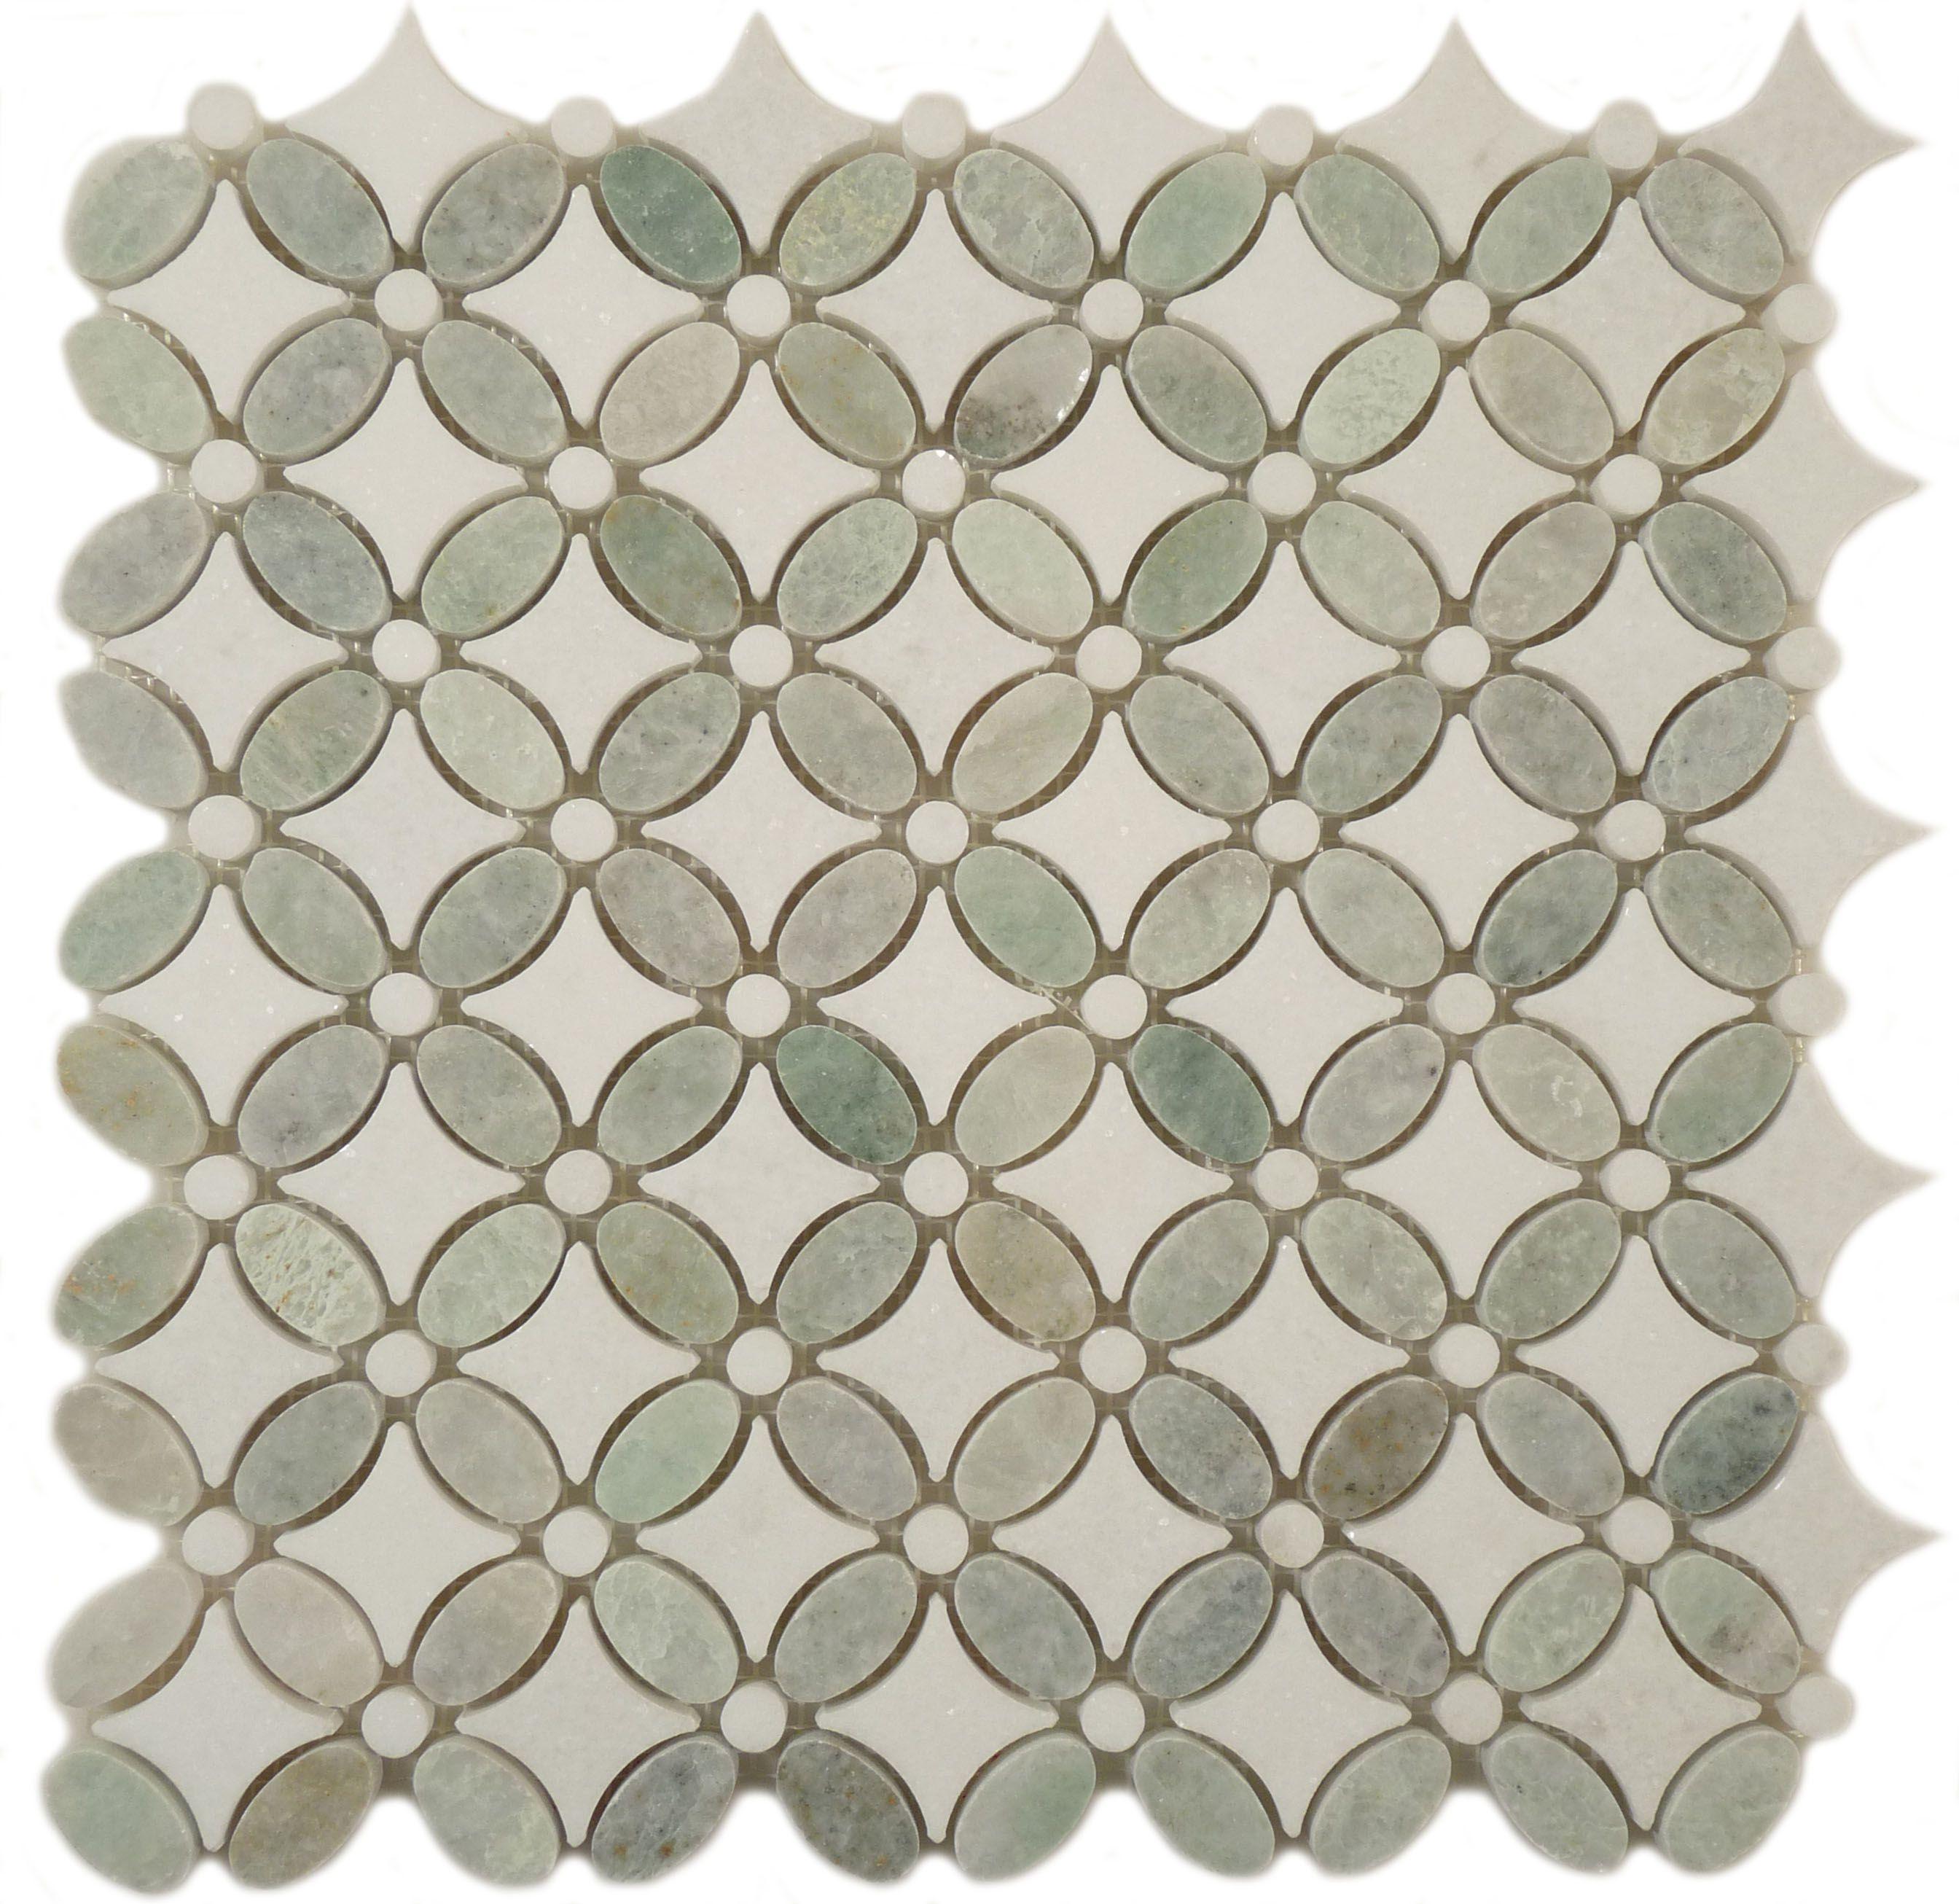 Euro glass backsplash flower ming green thassos white ming green thassos white flower green kitchen polished stone modern tile by glass tile oasis dailygadgetfo Choice Image